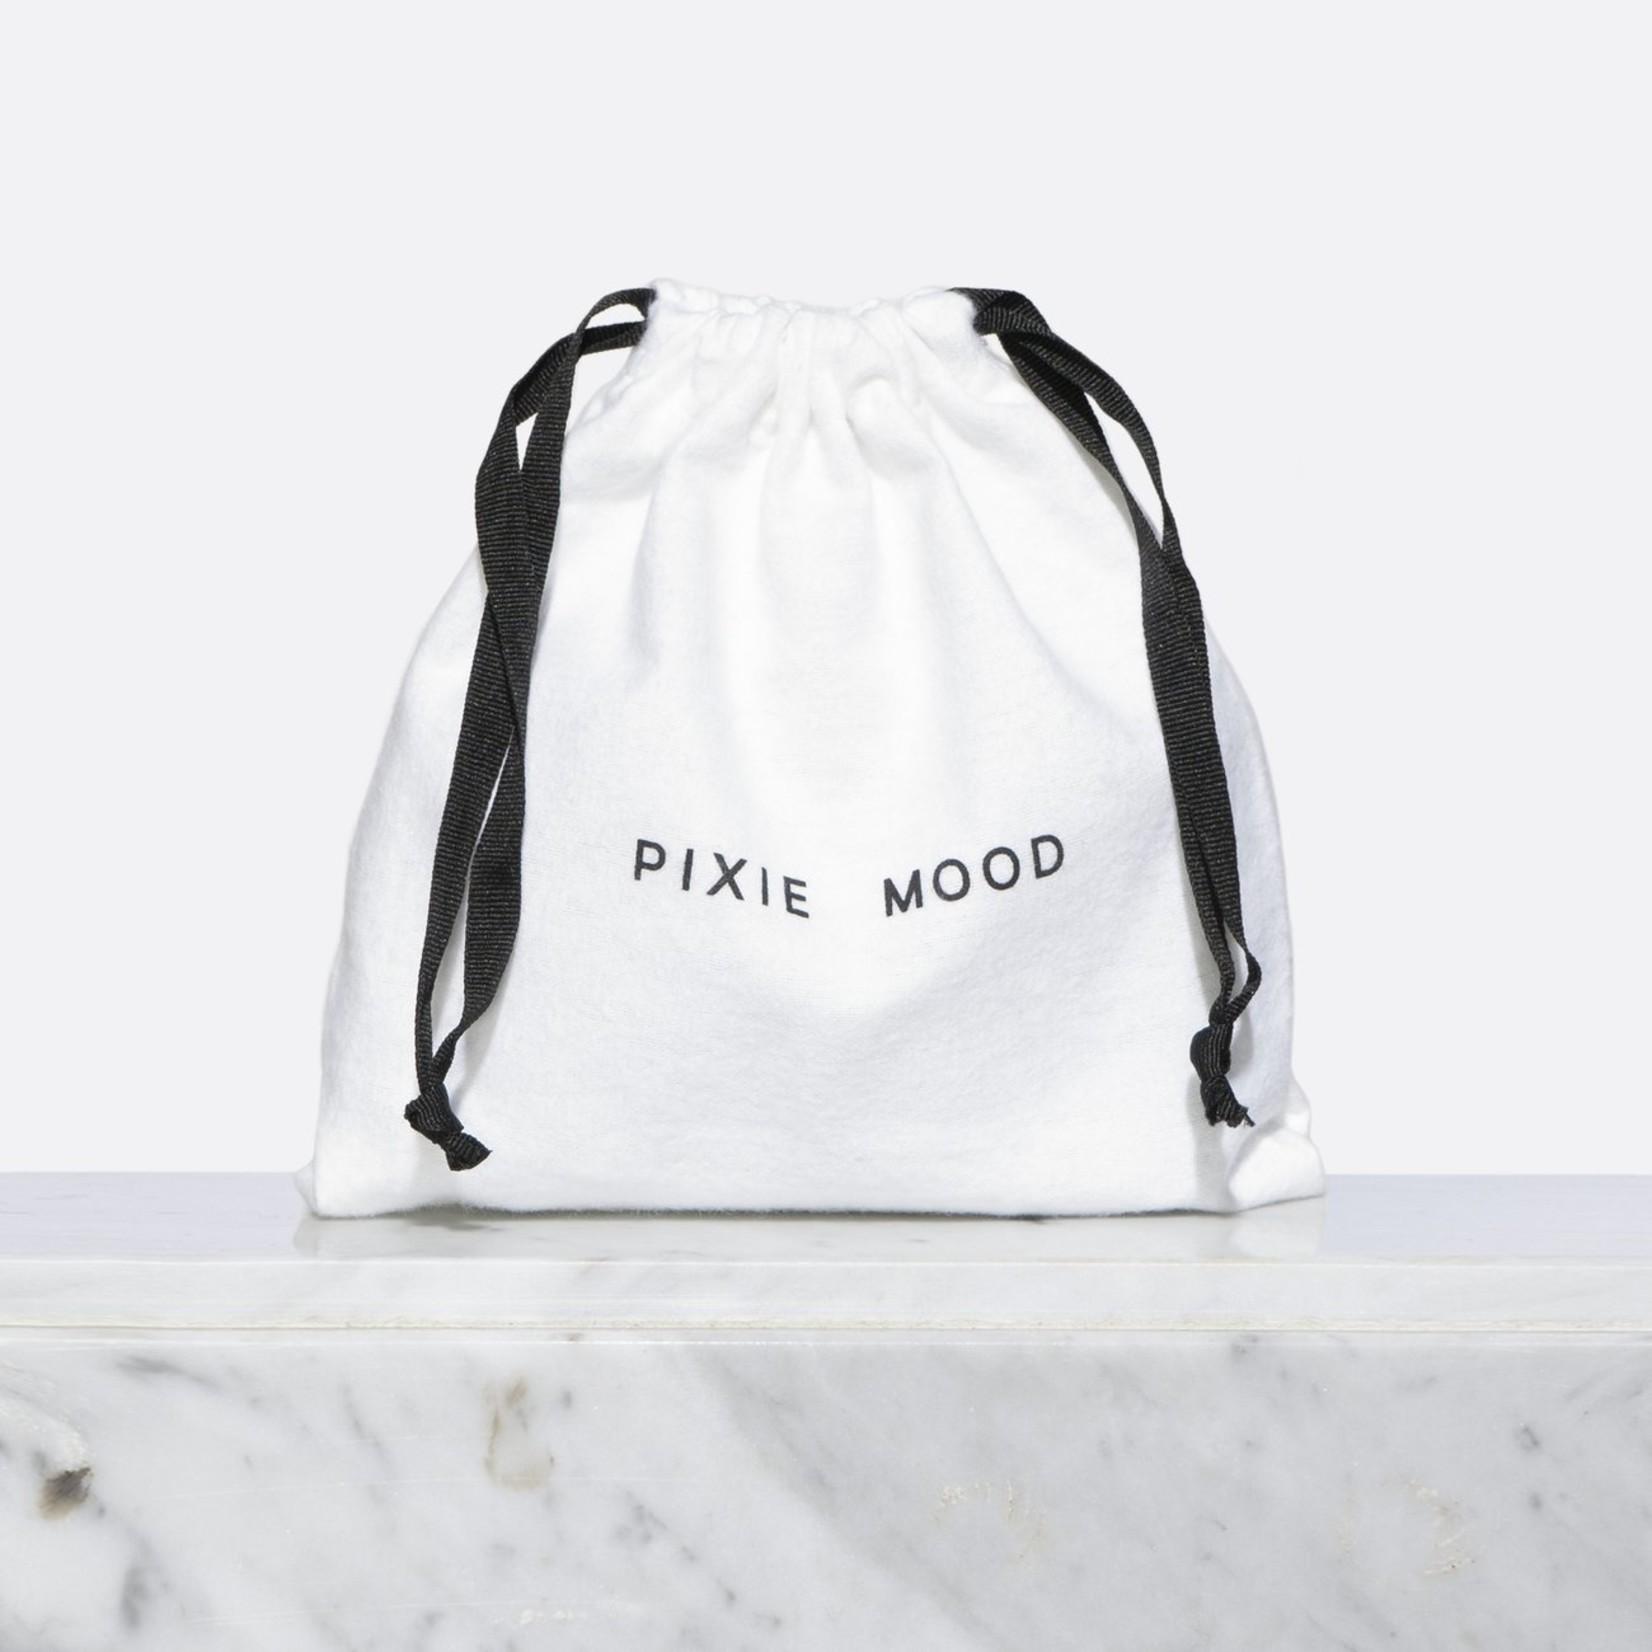 Pixie Mood Blake Jewelry Case